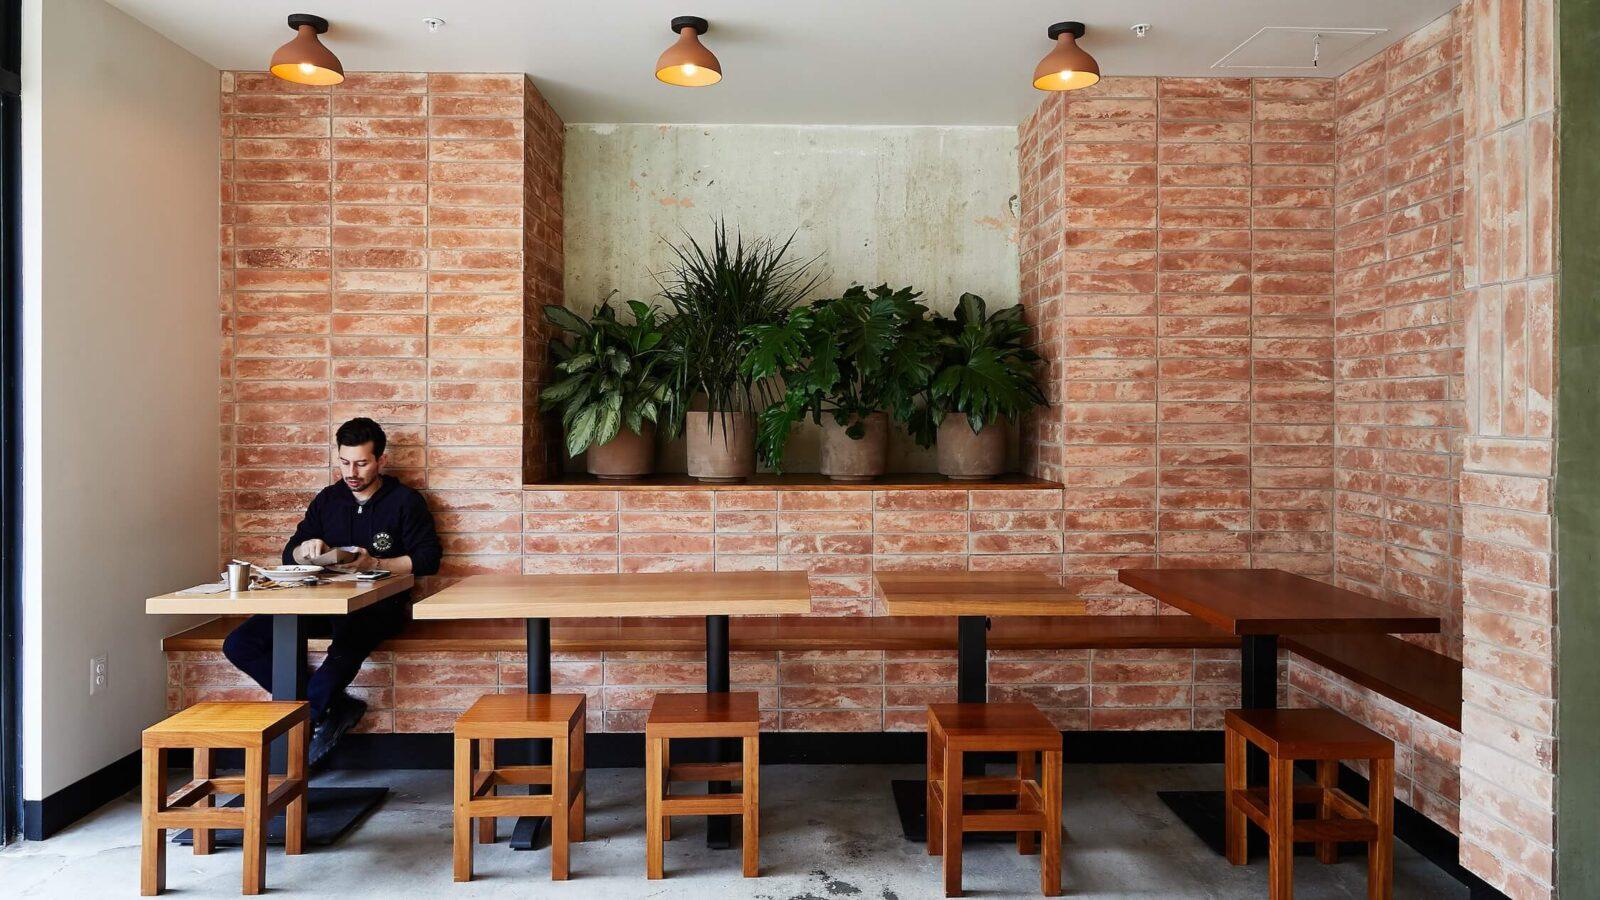 Loqui Taco Restaurant by Wick Architecture, interior view